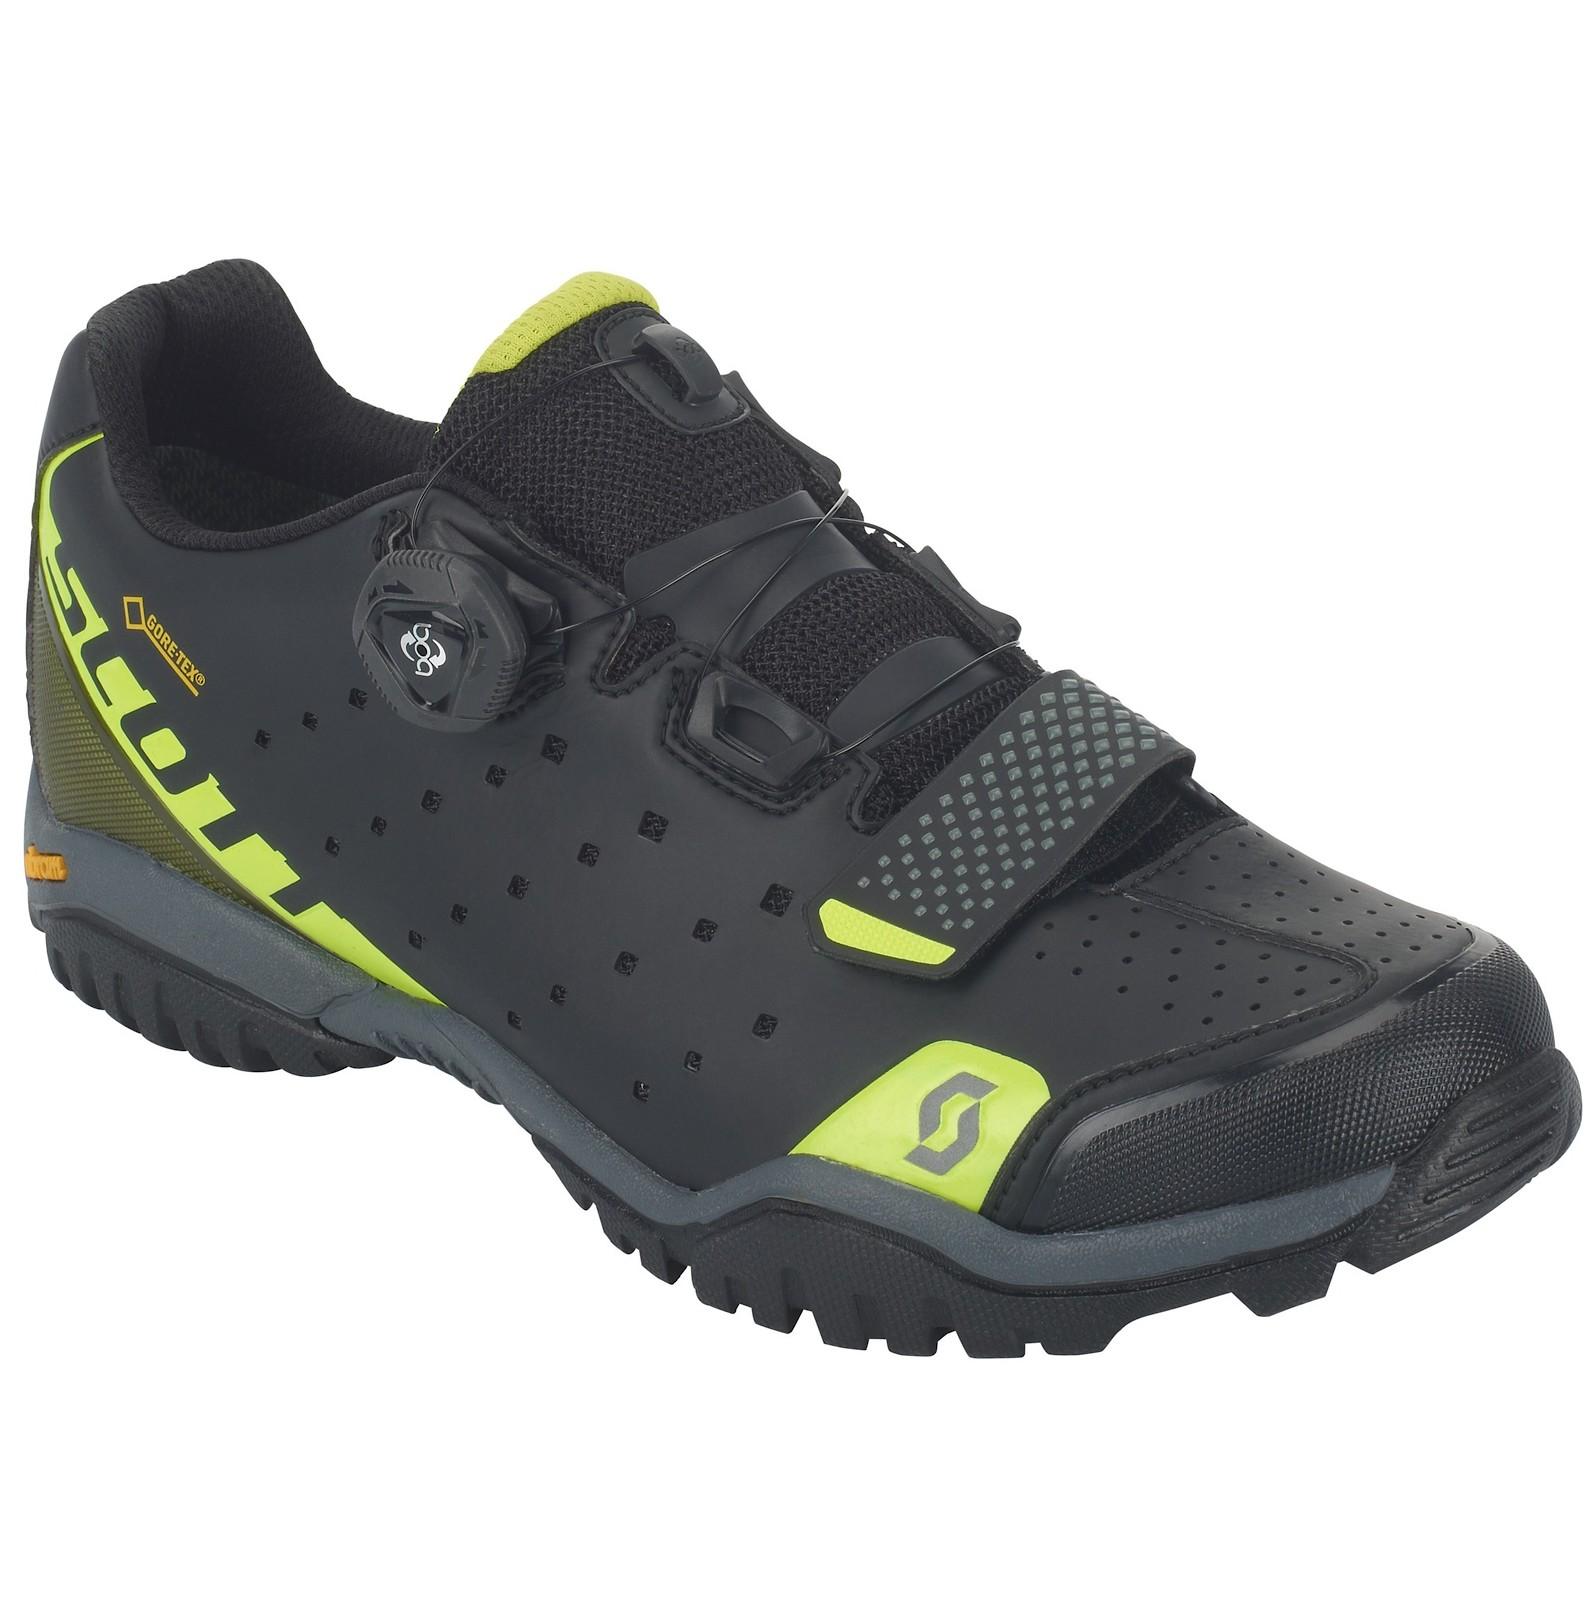 Scott Sport Trail Evo GORE-TEX shoe in caviar black/sulphur yellow